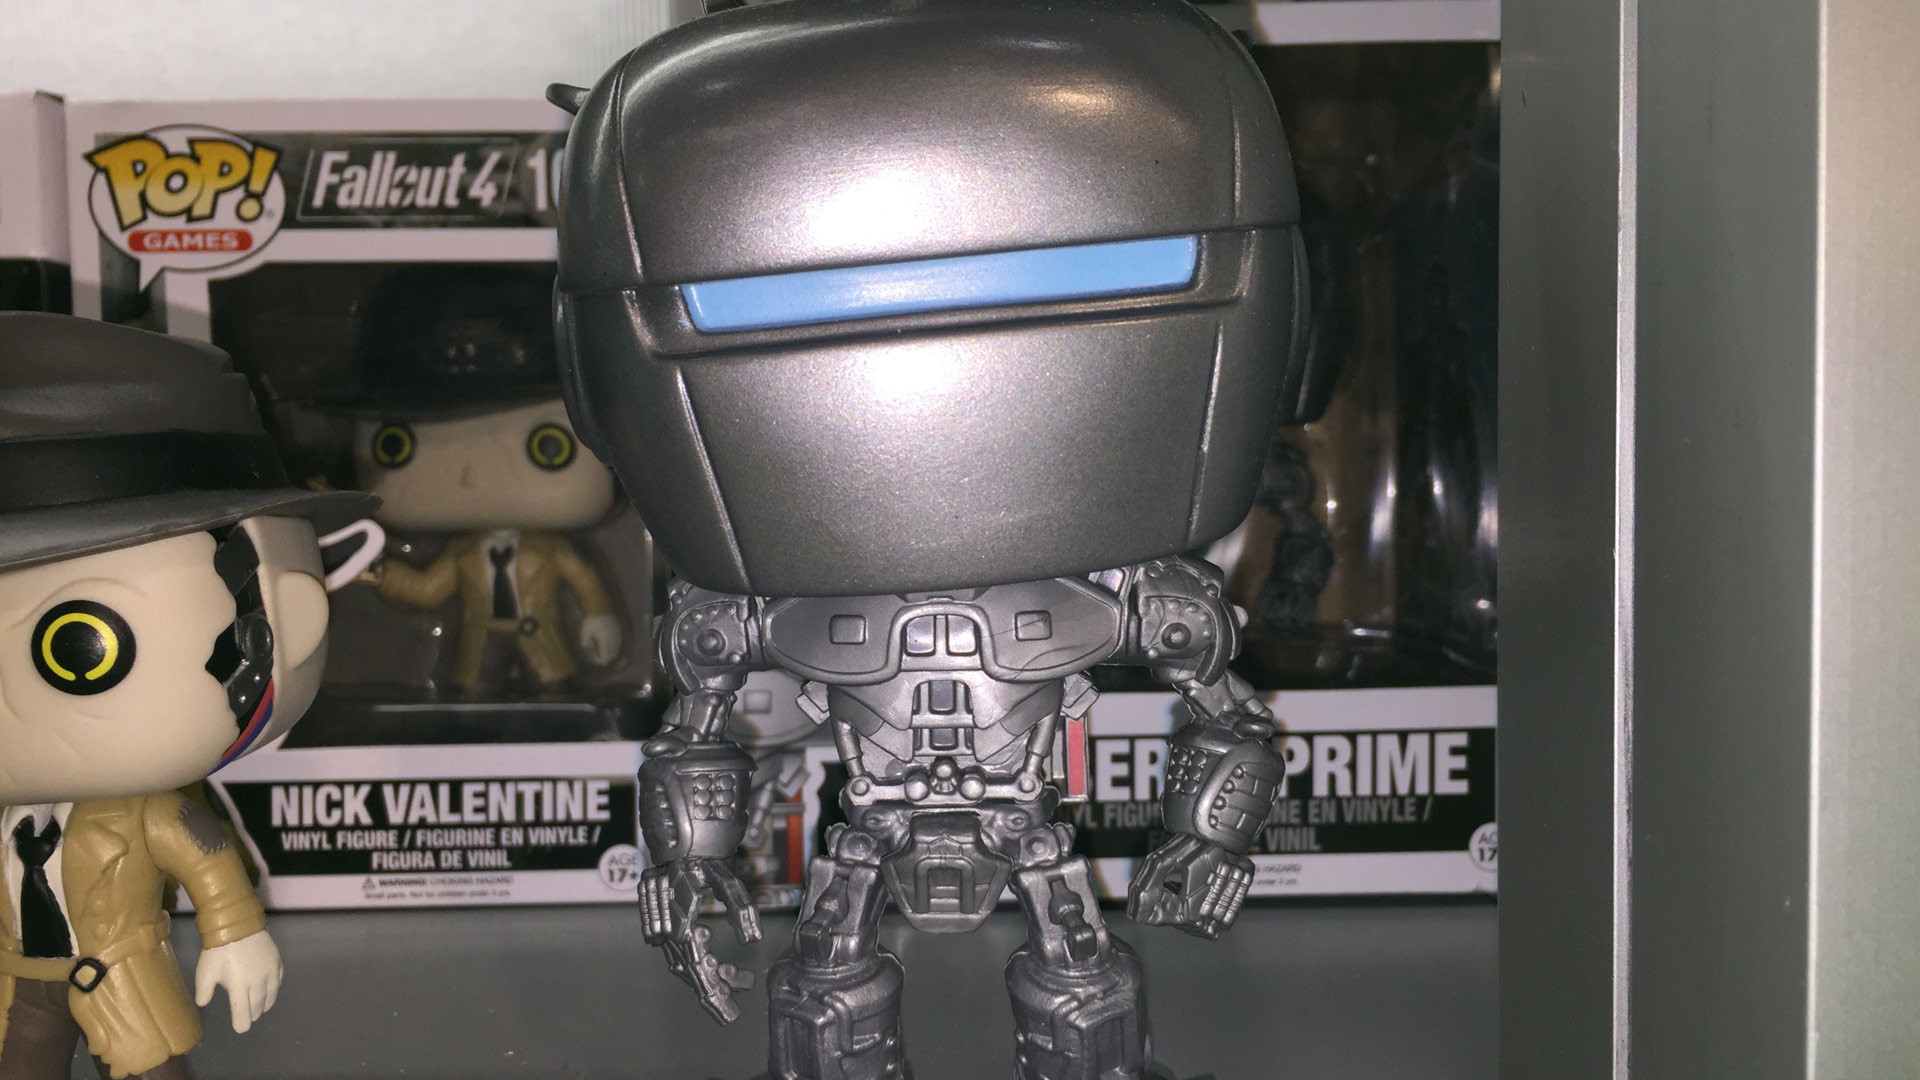 Funko Pop Fallout 4 Liberty Prime #167 Vinyl Figure at Toy Fair 2017